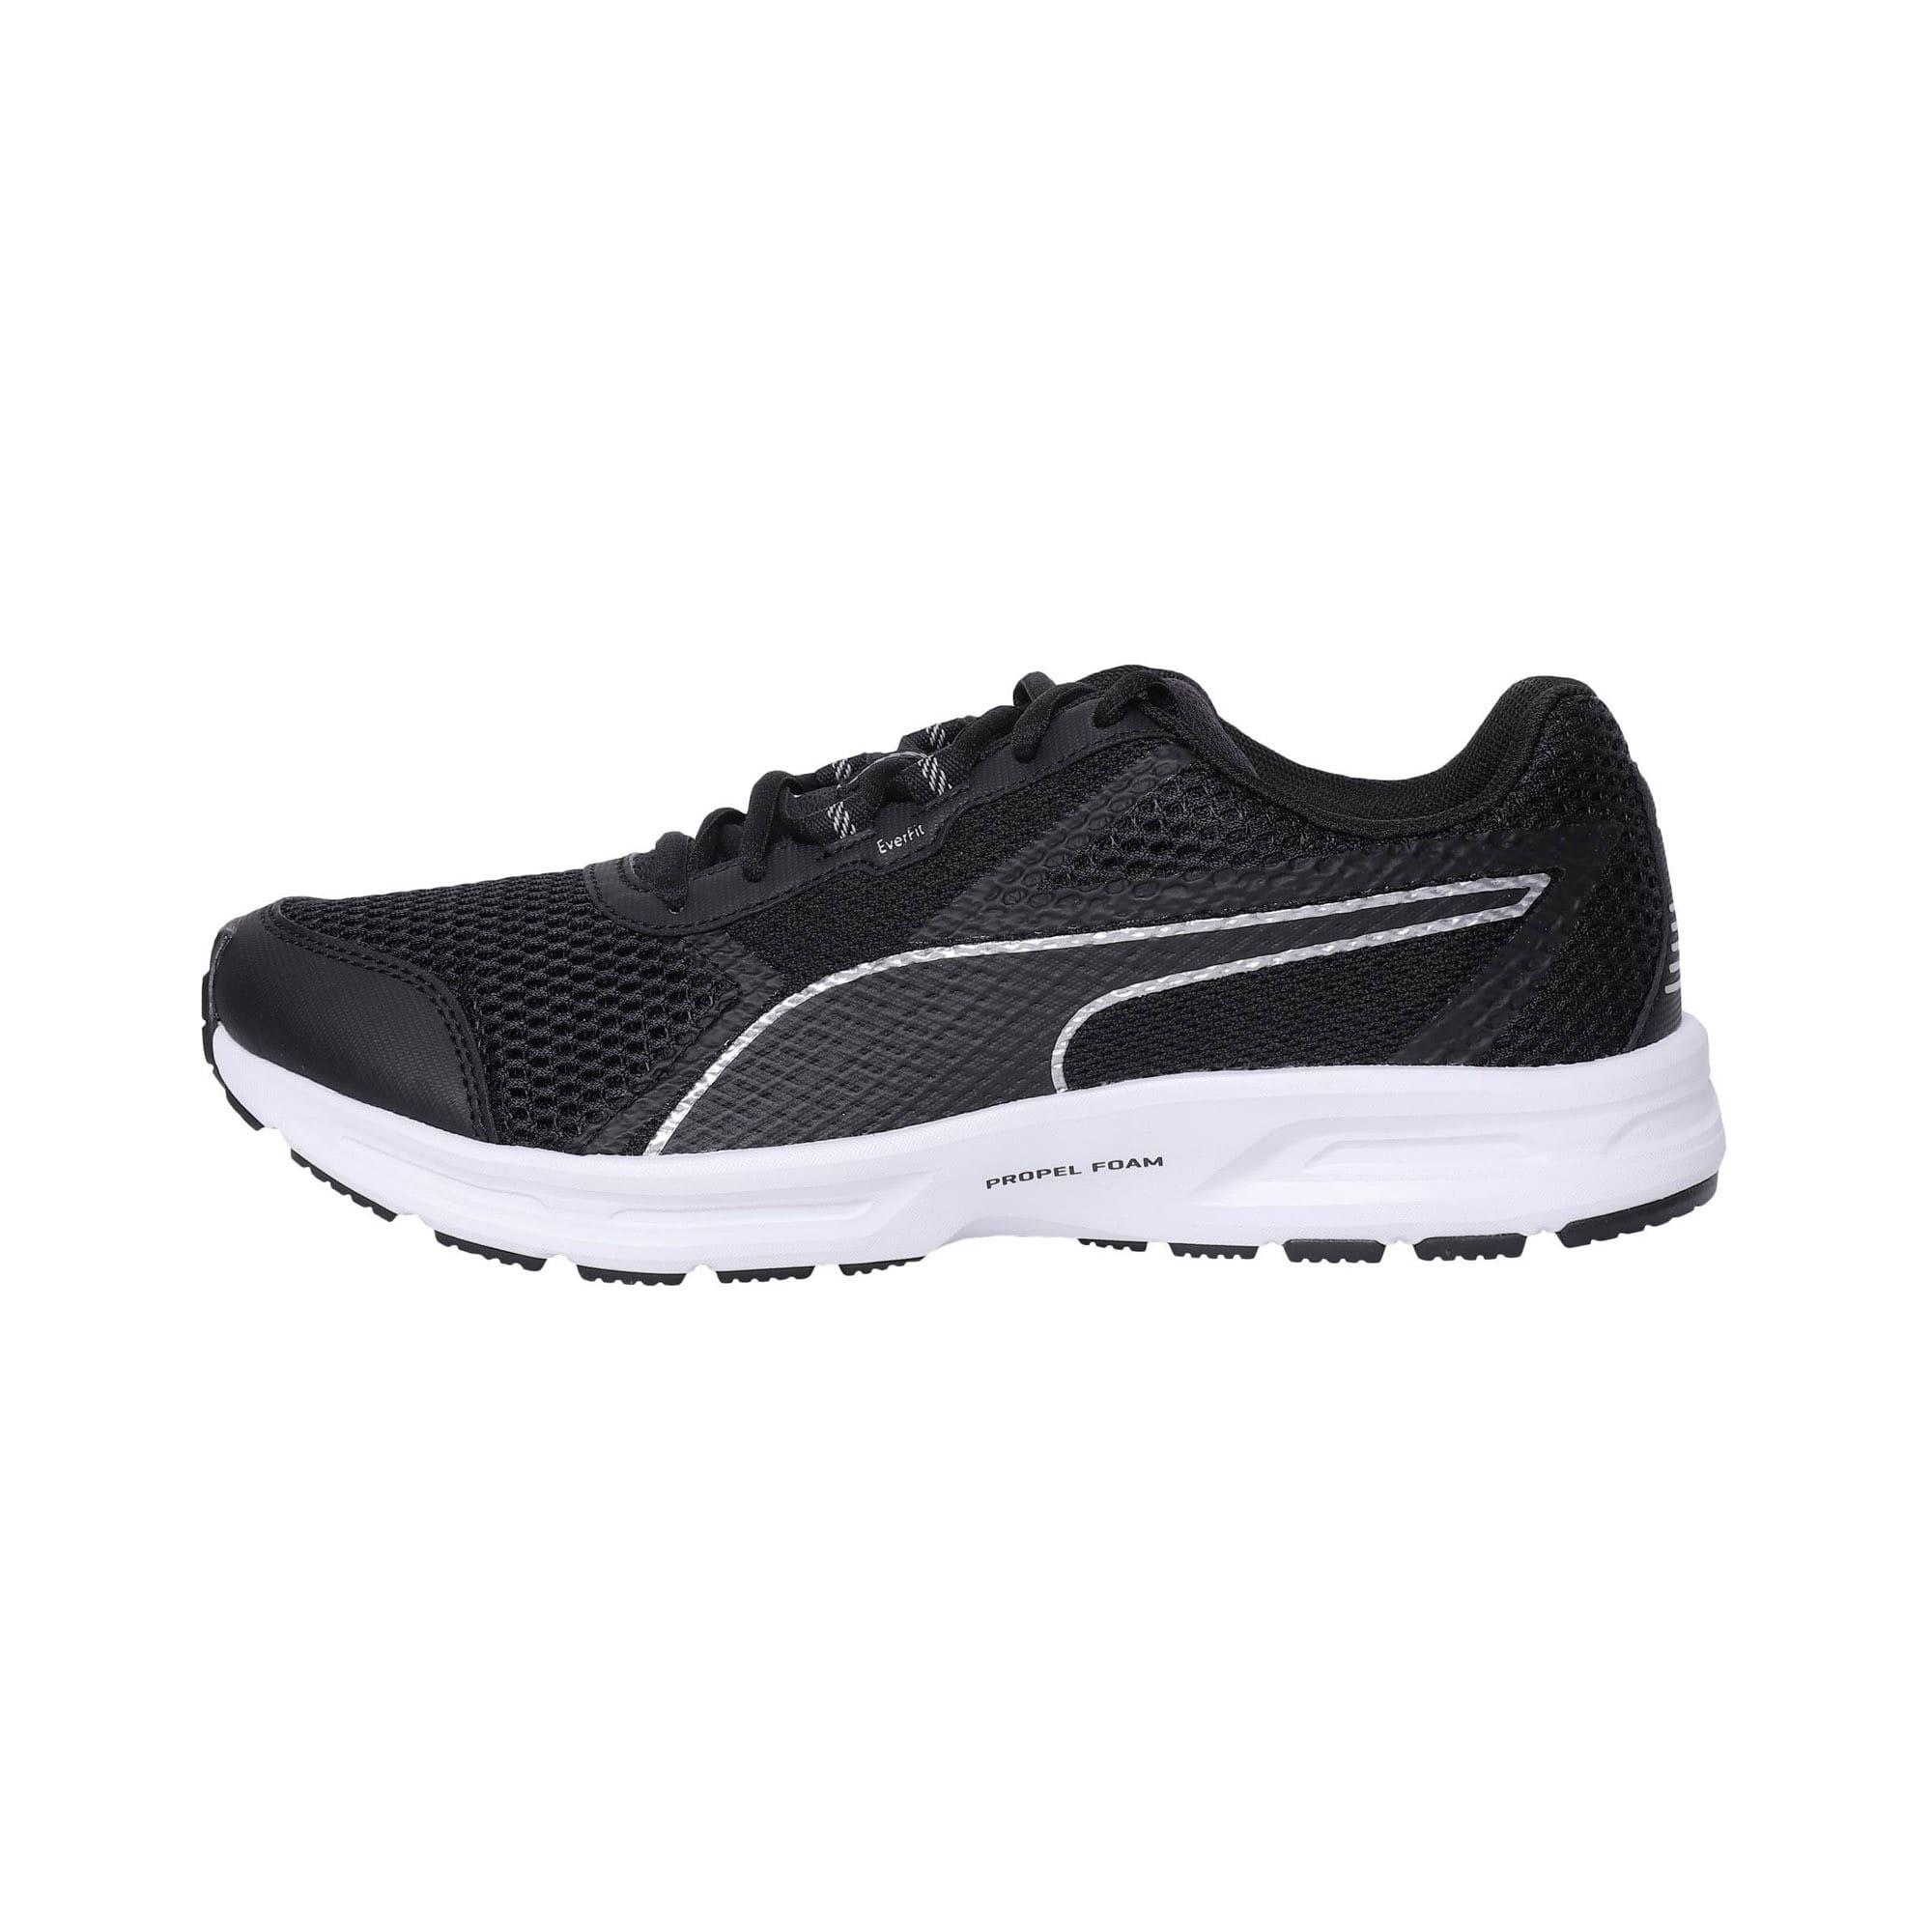 Thumbnail 1 of Essential Runner Men's Running Shoes, Puma Black-Puma Silver, medium-IND